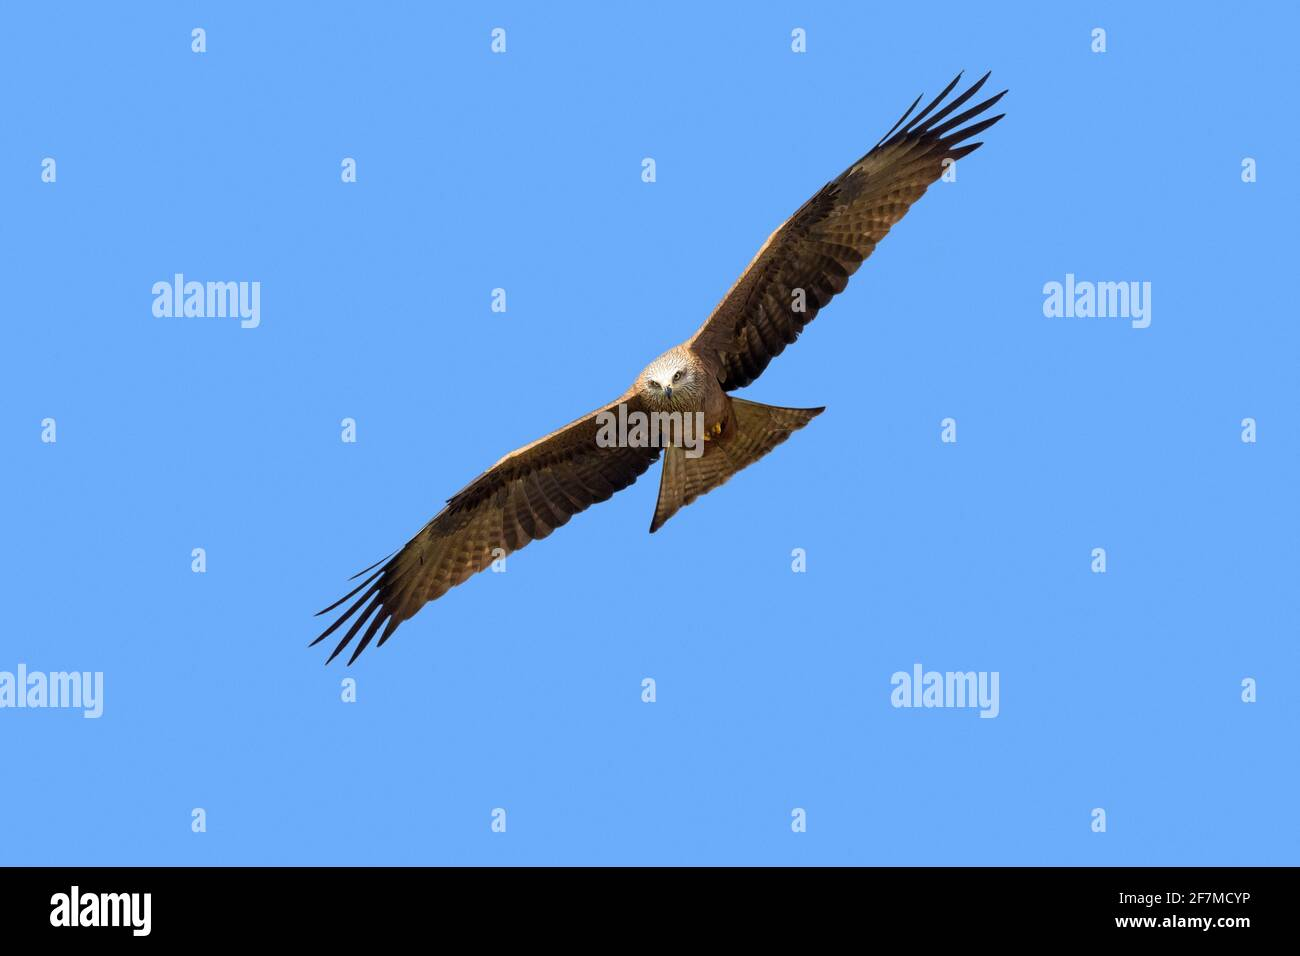 Black kite (Milvus migrans) in flight soaring against blue sky Stock Photo